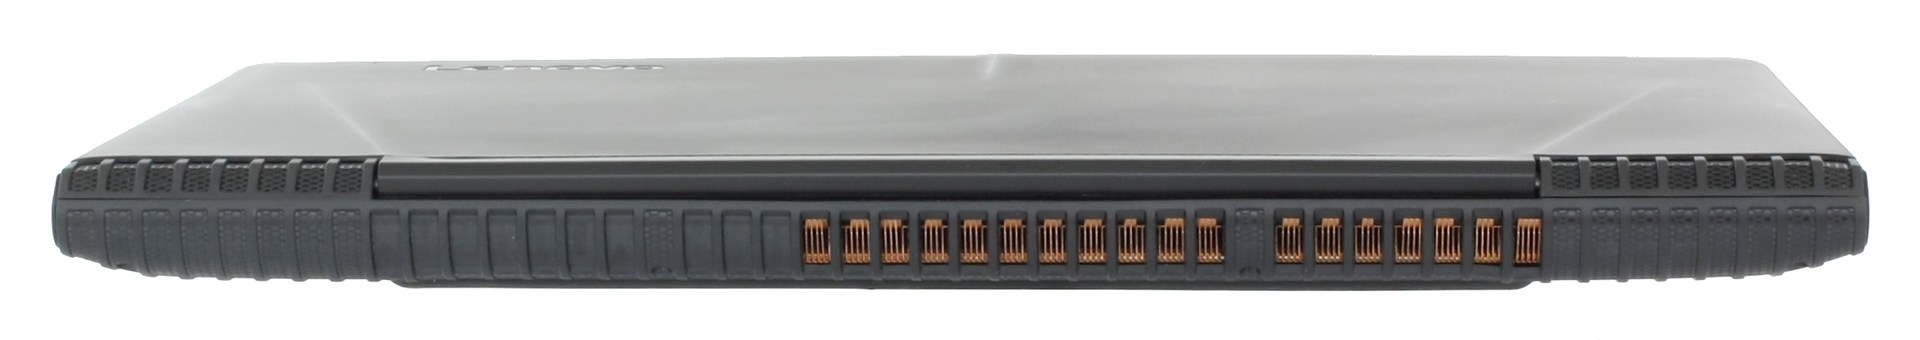 review Lenovo Legion Y520 (GTX 1050 Ti) 600 05